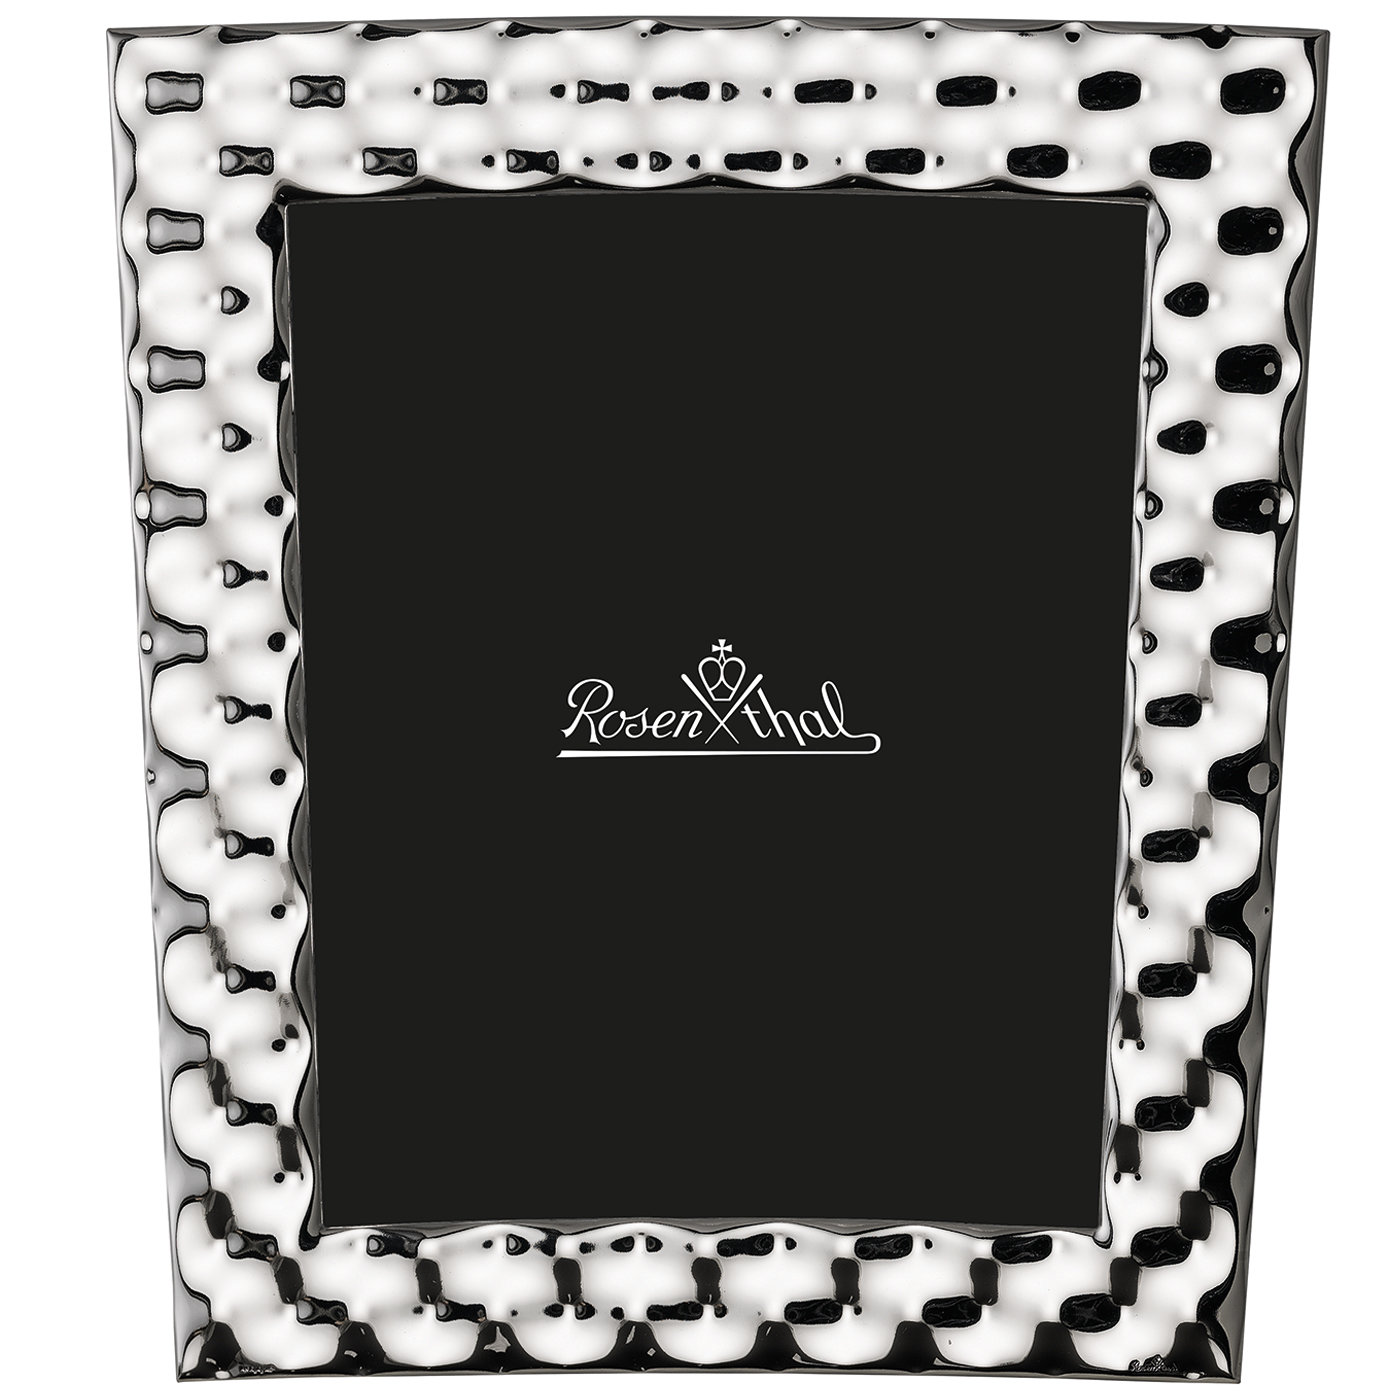 rosenthal-silver-collection-move-bilderrahmen-20-x-25-cm-1505875507_11400x1400-center